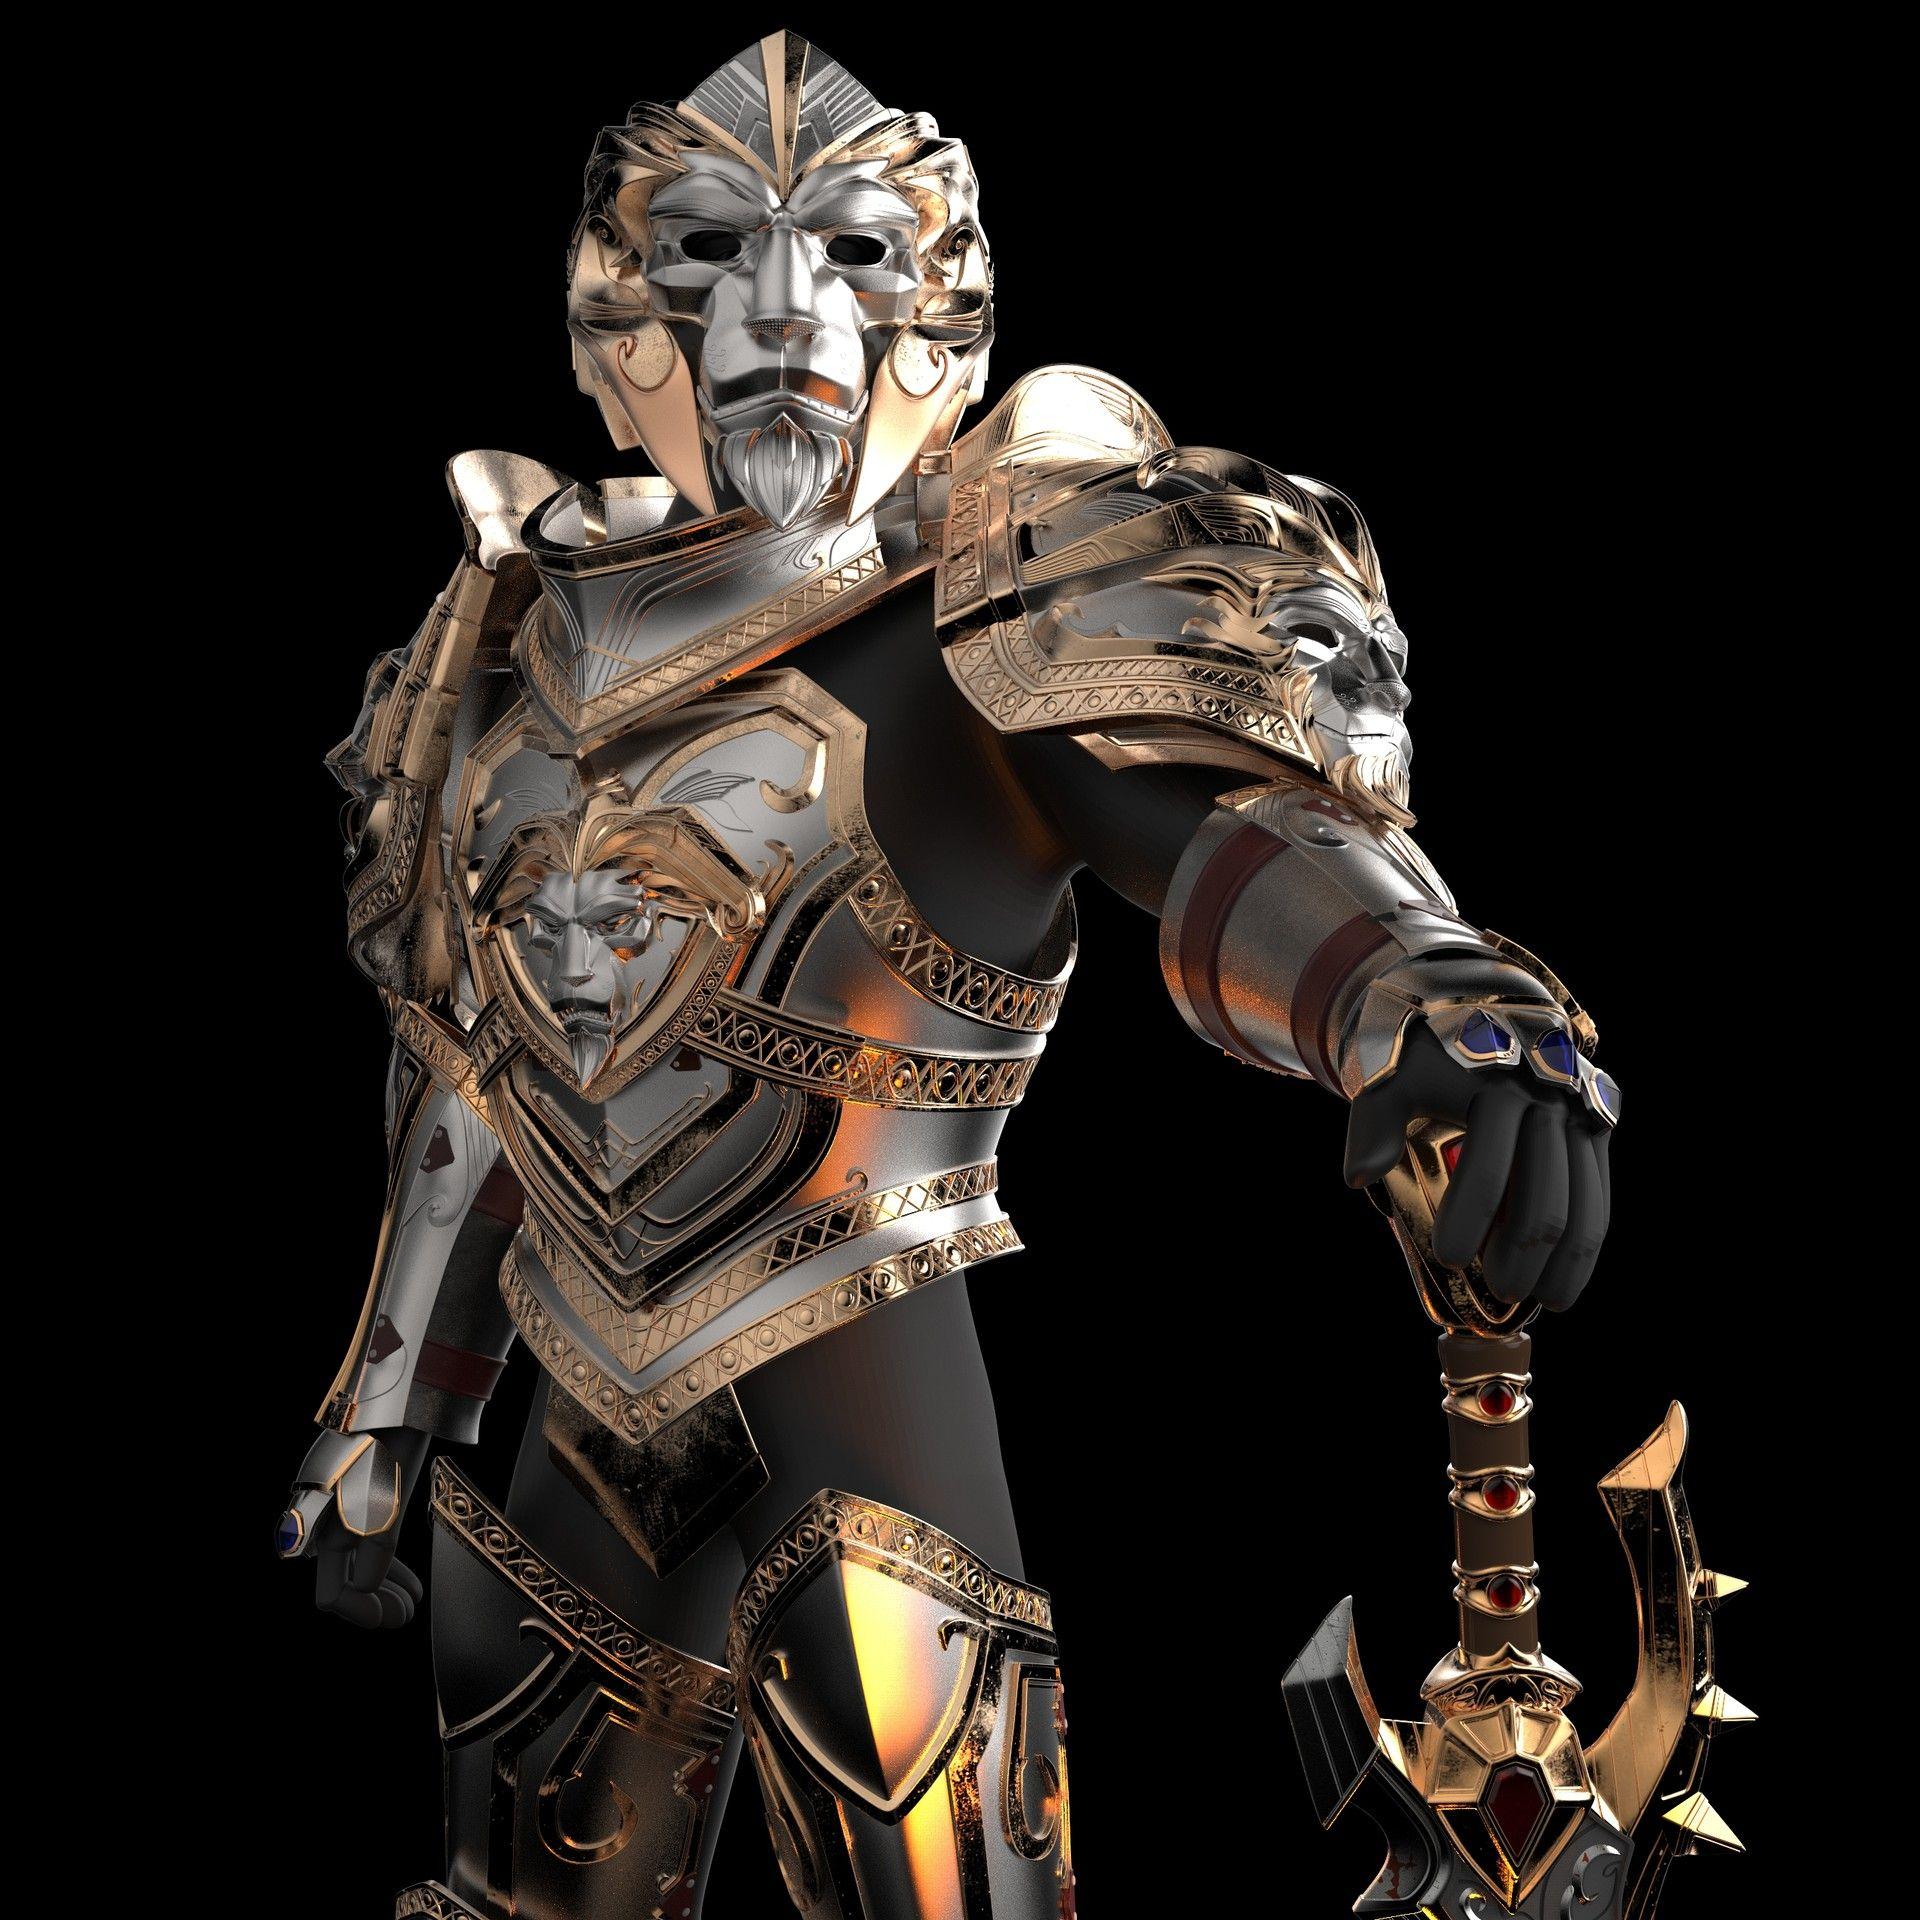 Wladimir Kovalenko Sword Anduin Wrynn Wow Battle For Azeroth 21 Cosplay Armor Wow Battle Armor